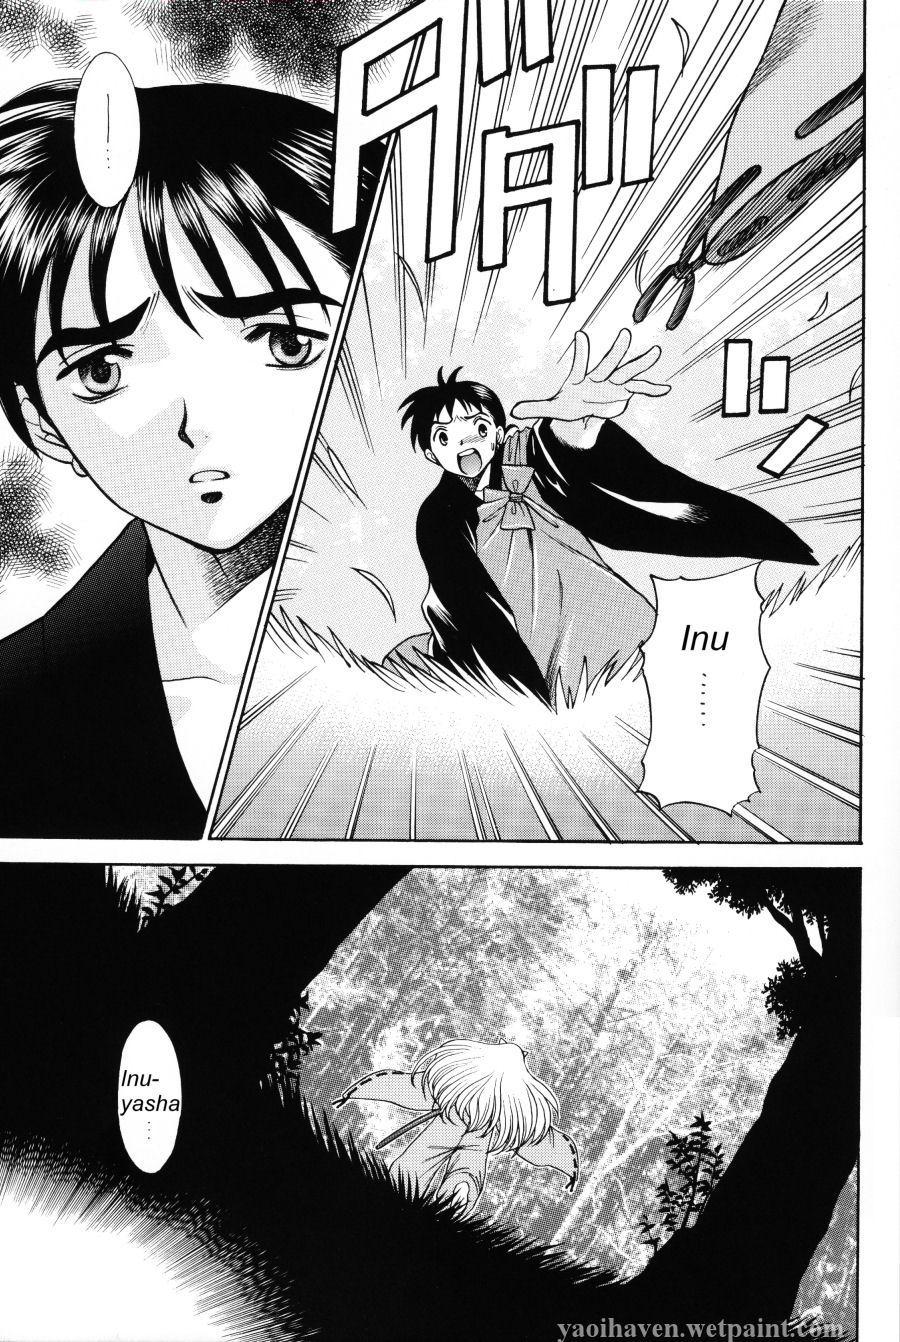 [Masakazu Akagi] Hanaoto [EN] yaoi 19